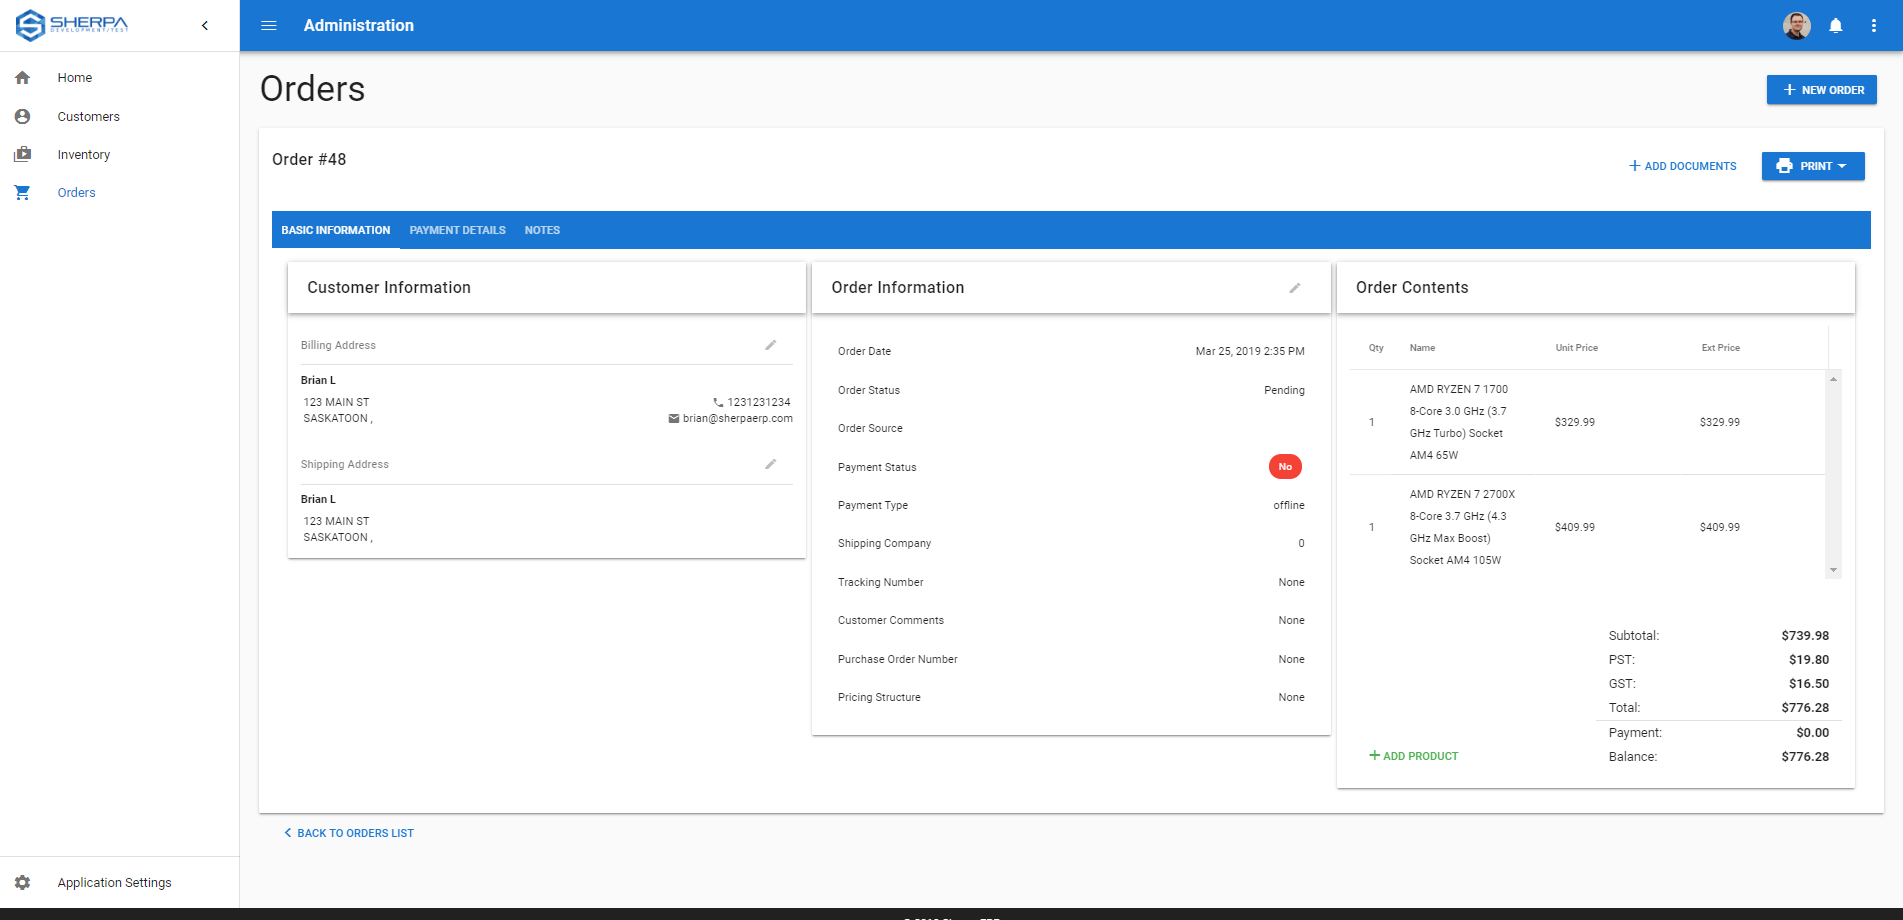 Order management dashboard